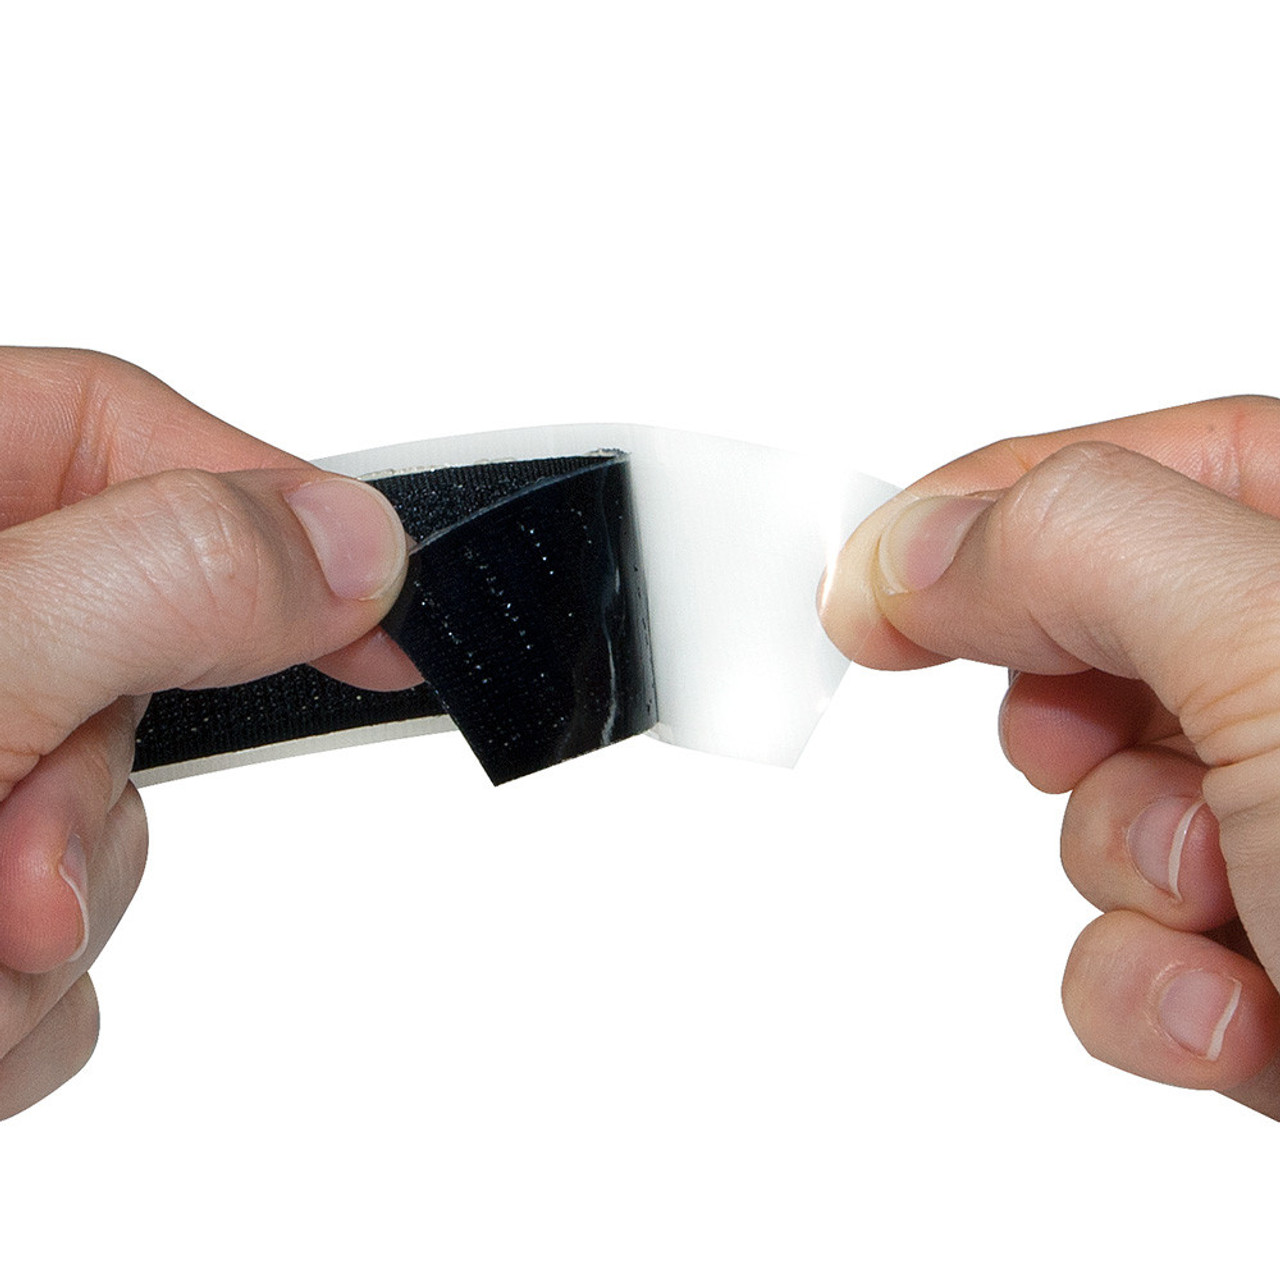 Adhesive Backing on Black or White